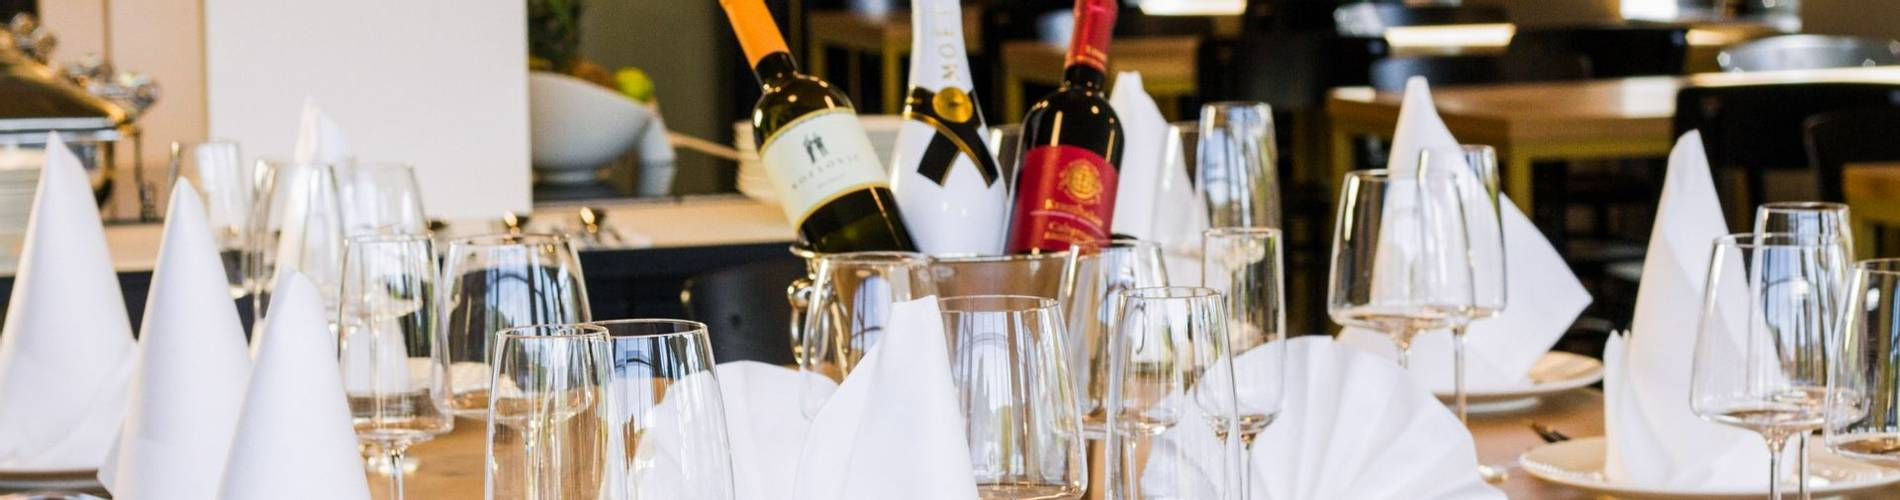 Hotel_Lyra_Plitvice_Restaurant_1.jpg